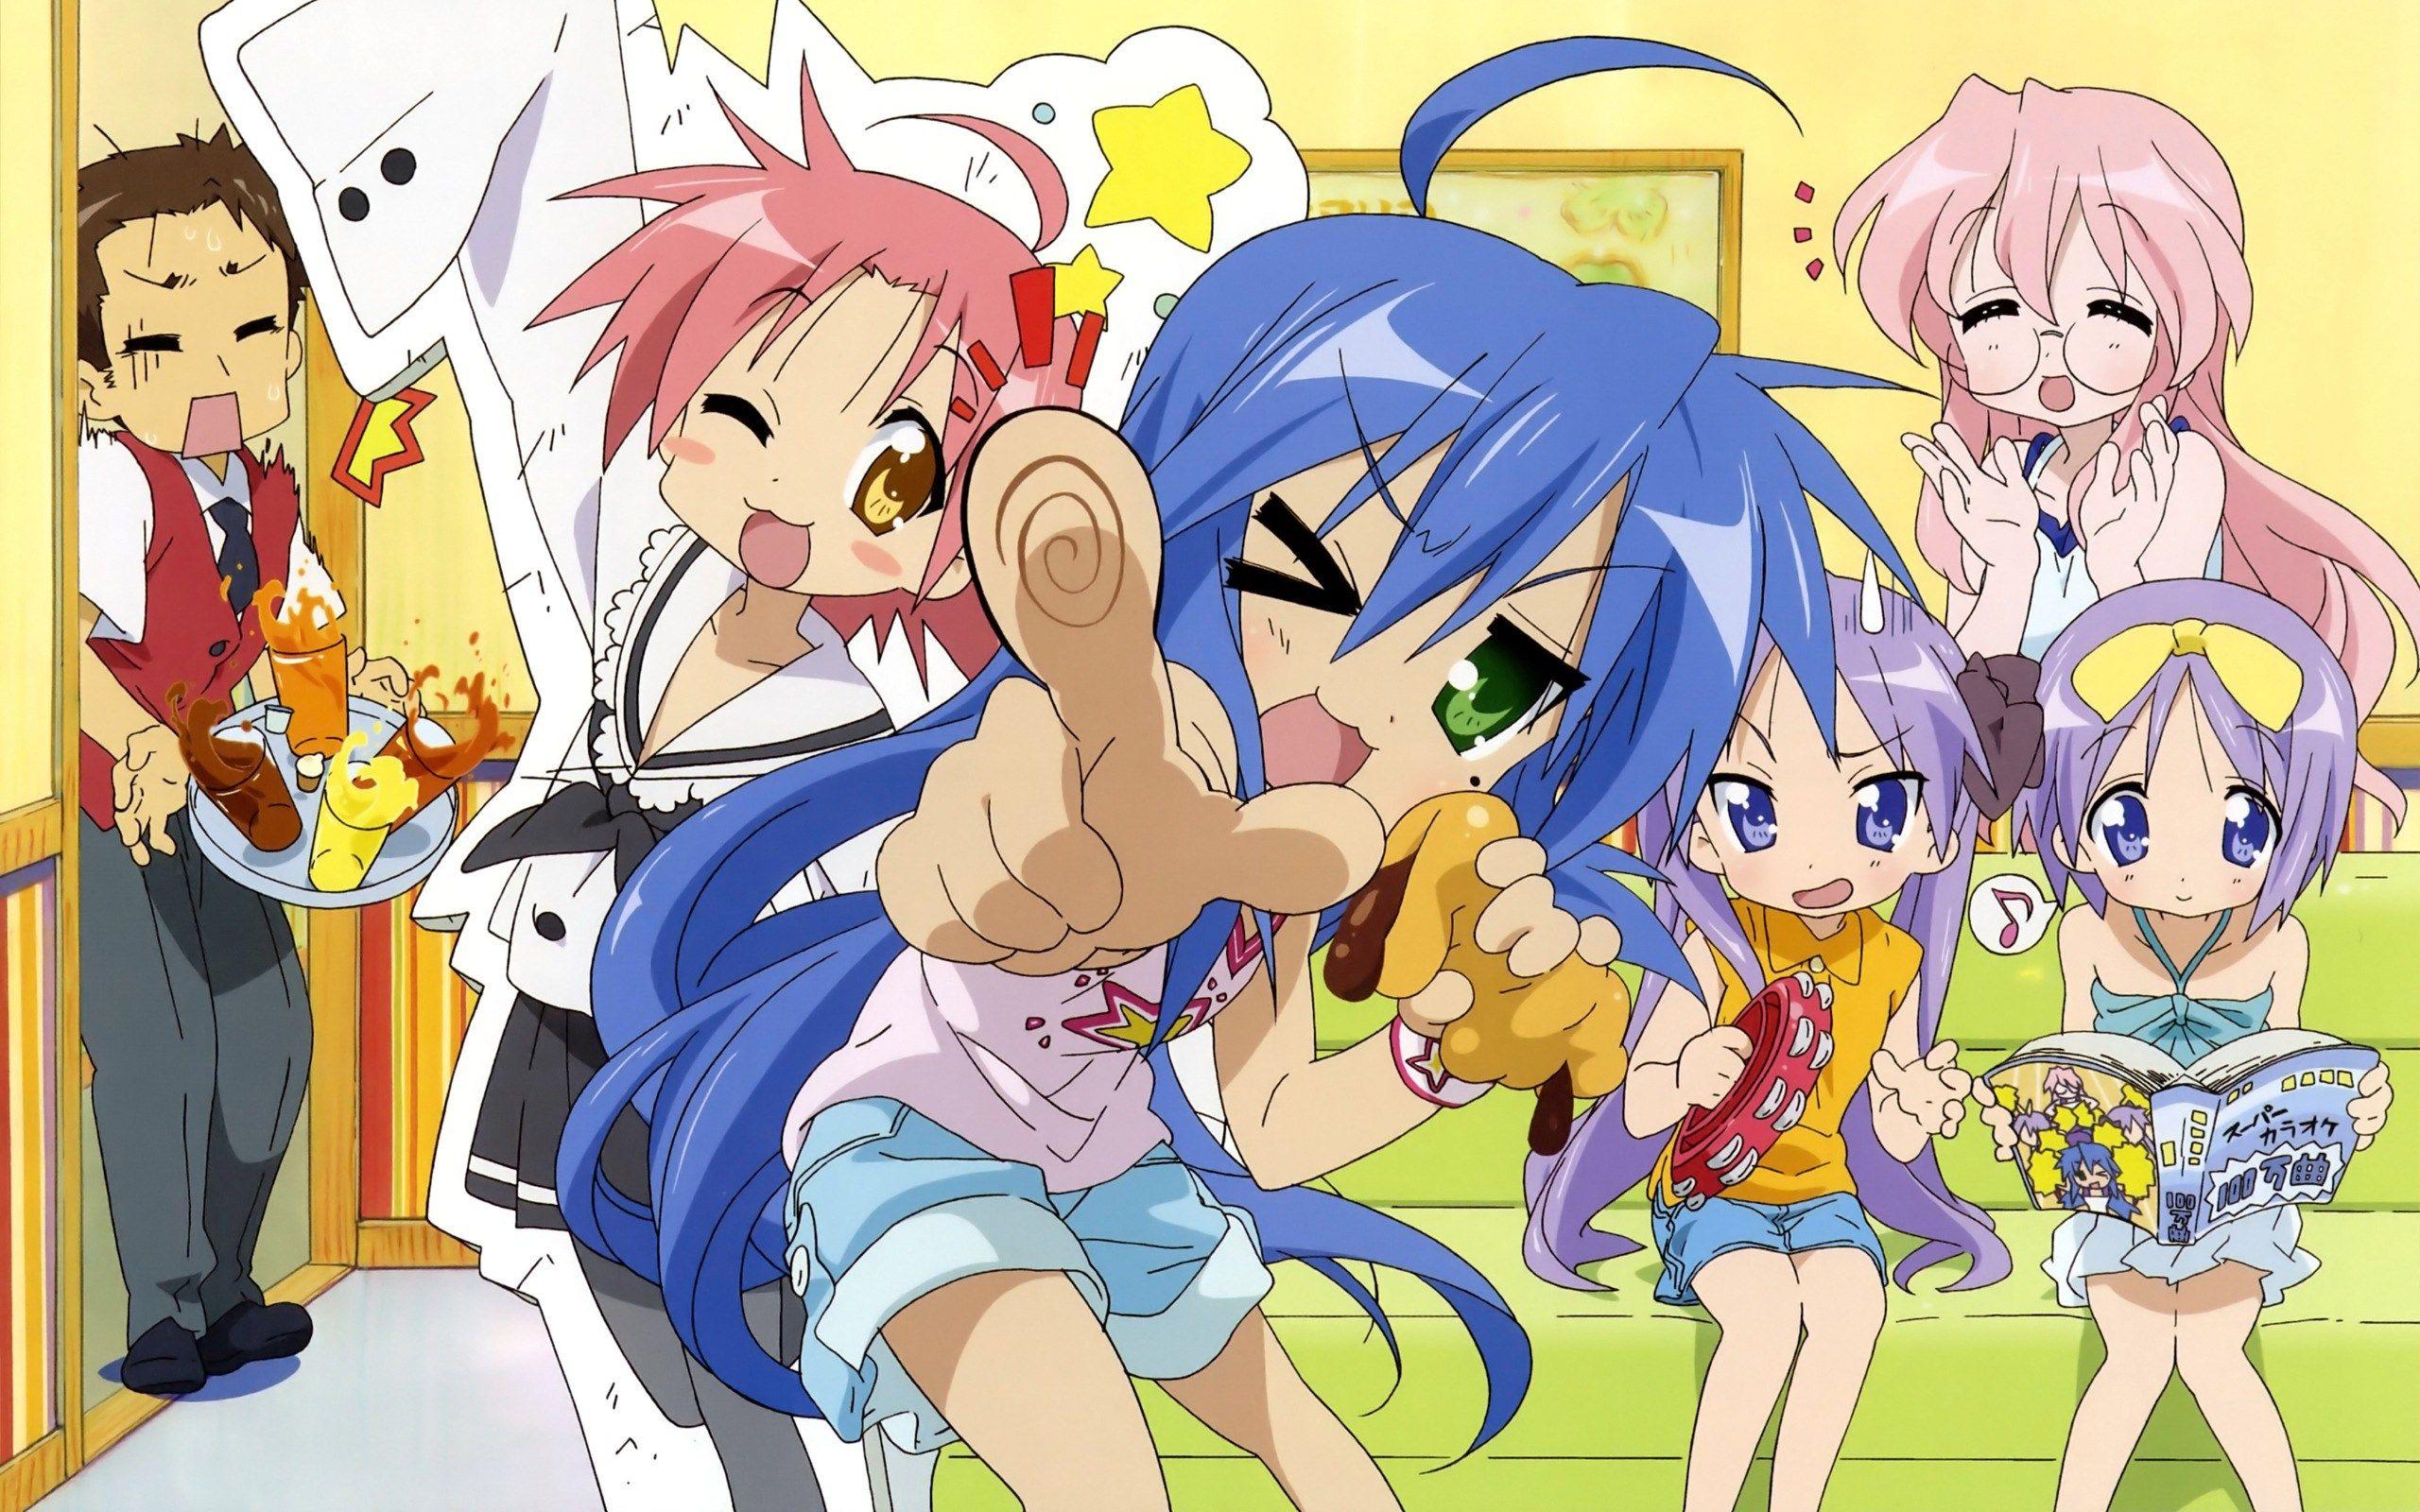 Lucky Star Konata Izumi Kagami Hiiragi Tsukasa Miyuki Takara And Other Characters From The Anime Series